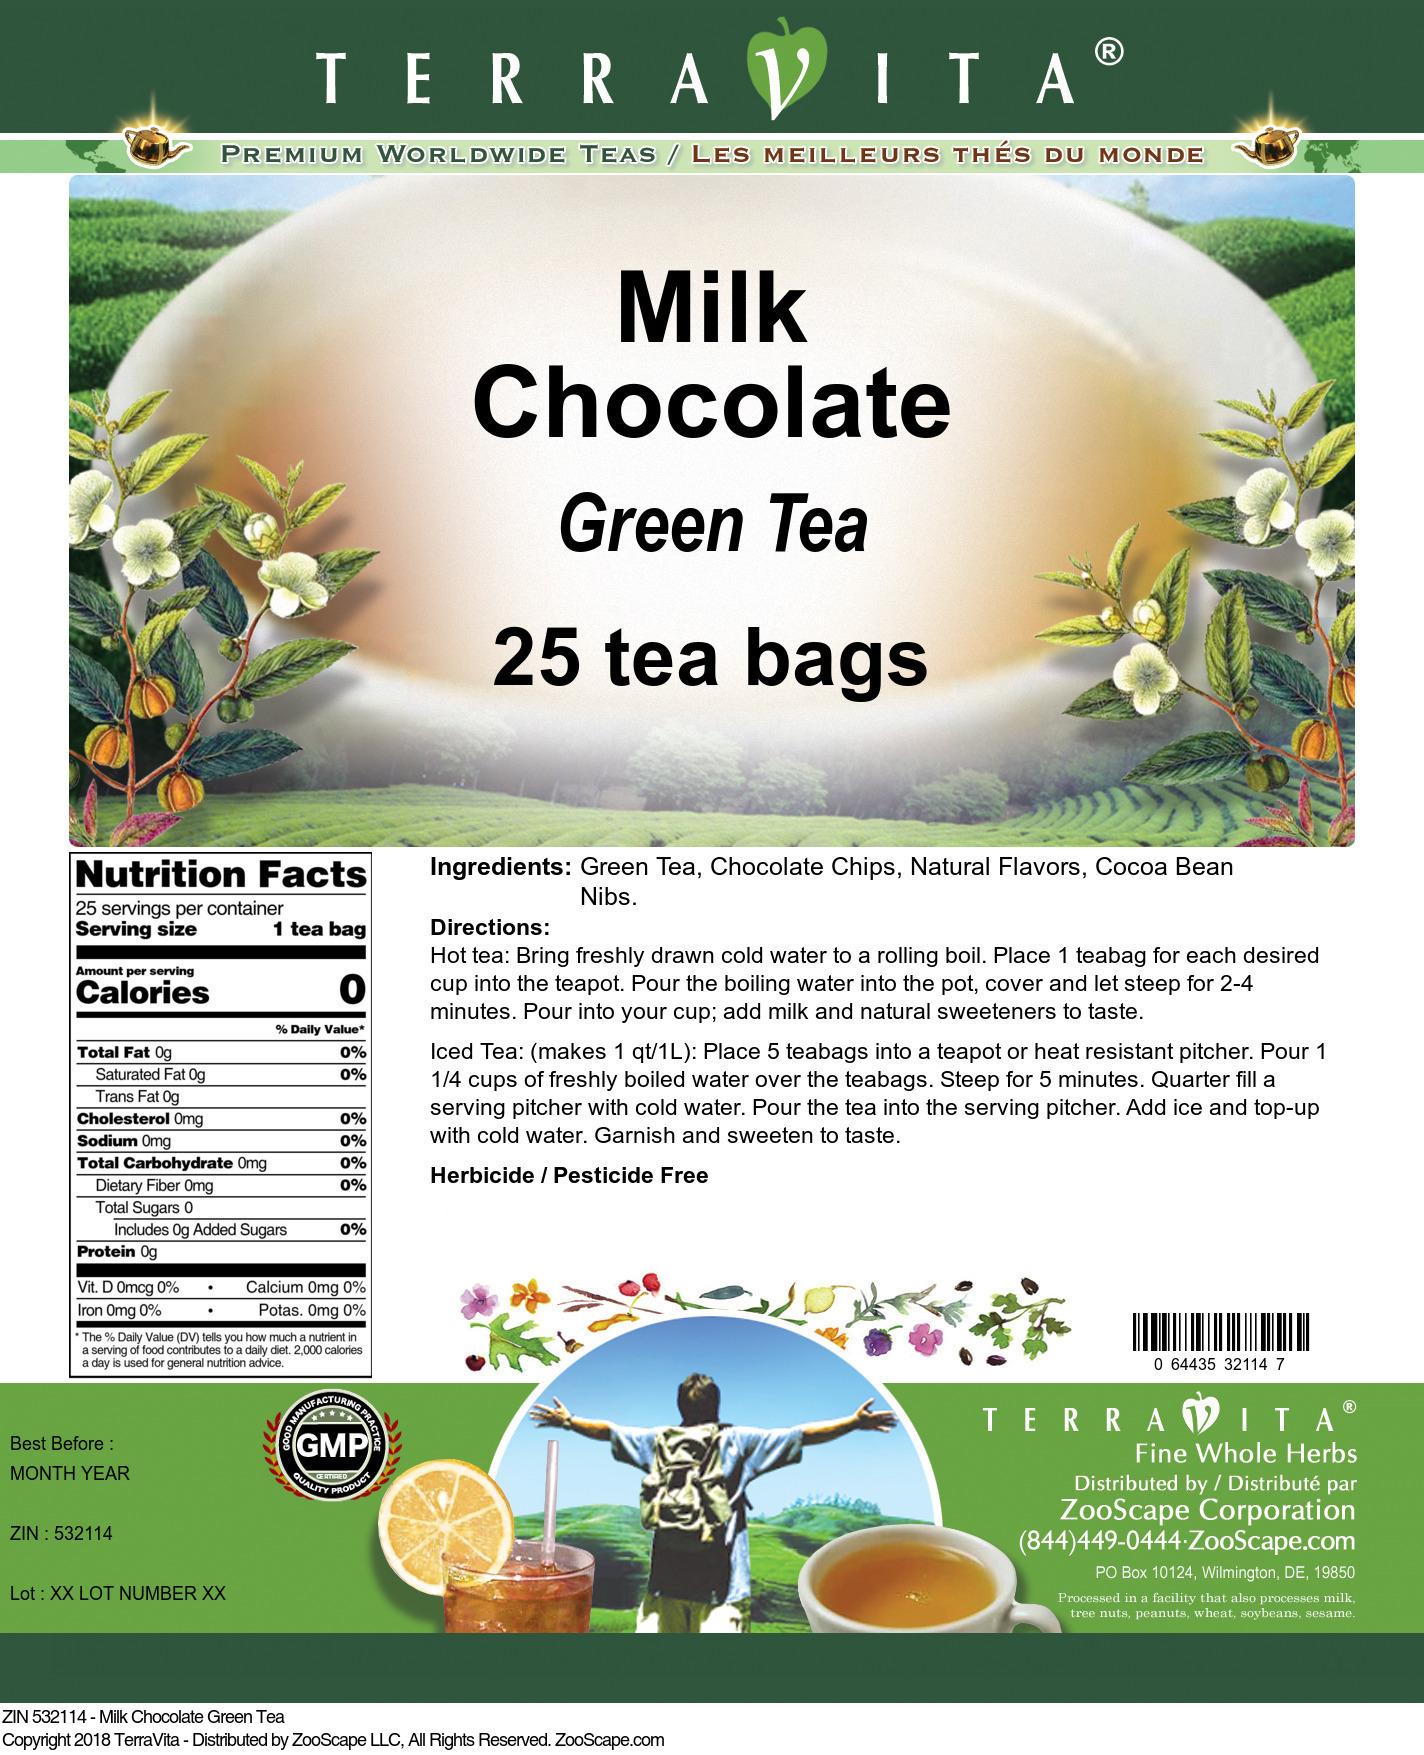 Milk Chocolate Green Tea